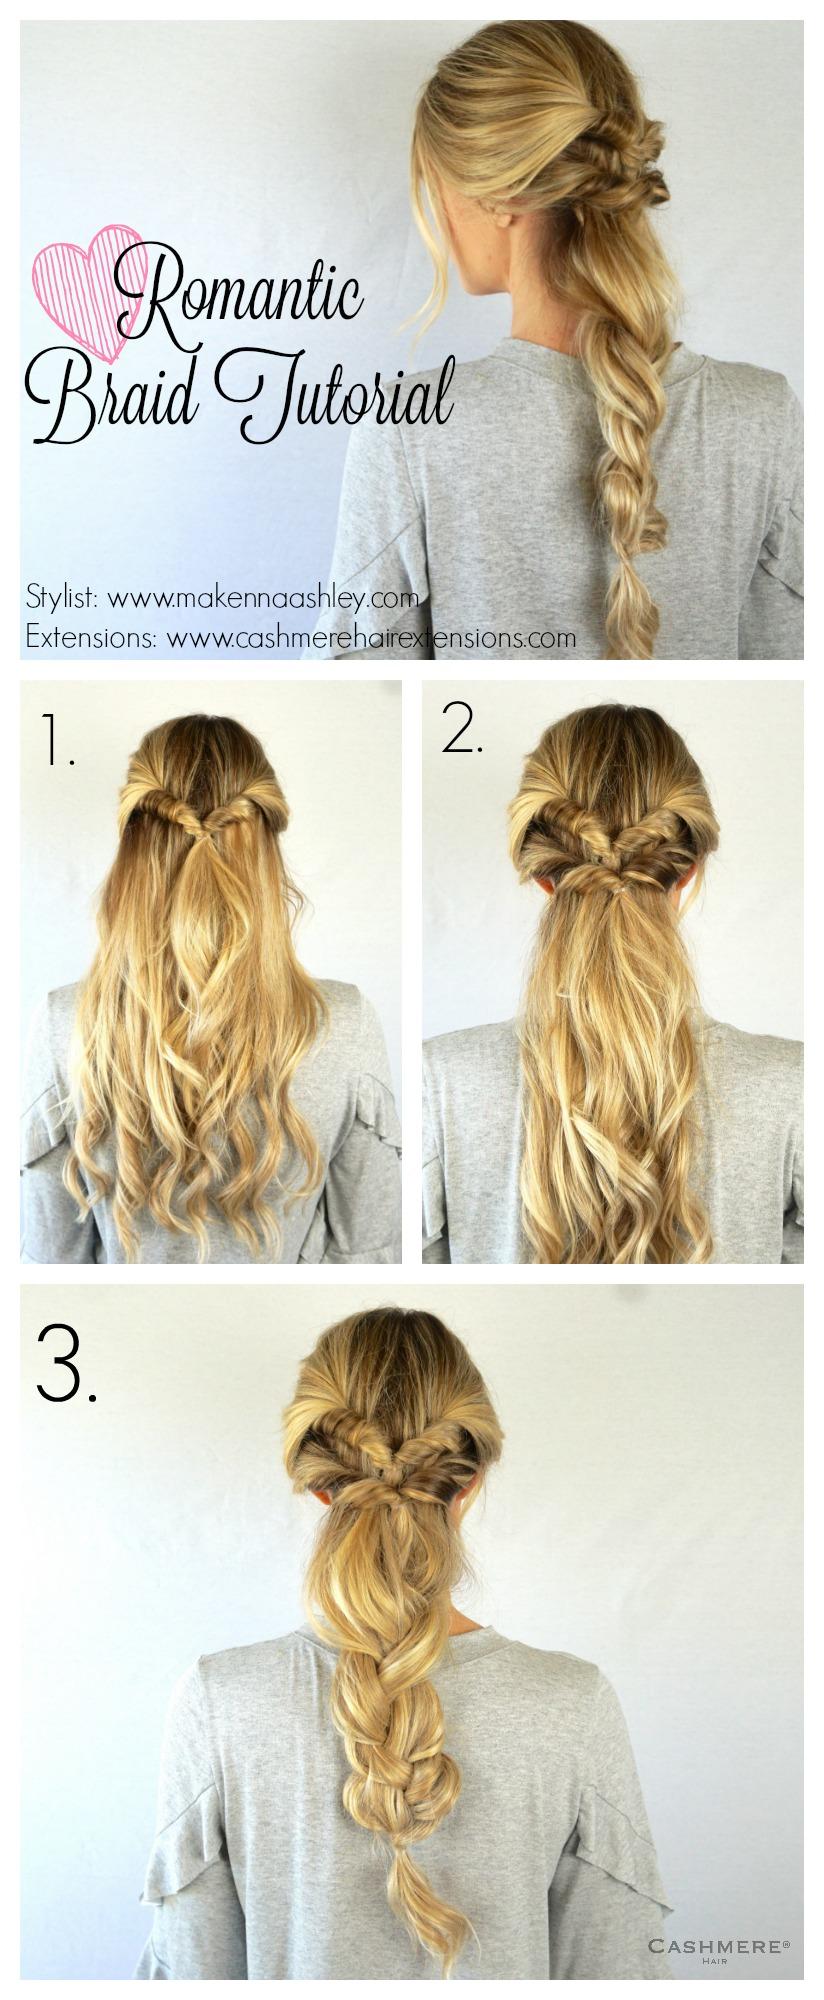 Romantic Braid Tutorial | Cashmere Hair Clip In Extensions